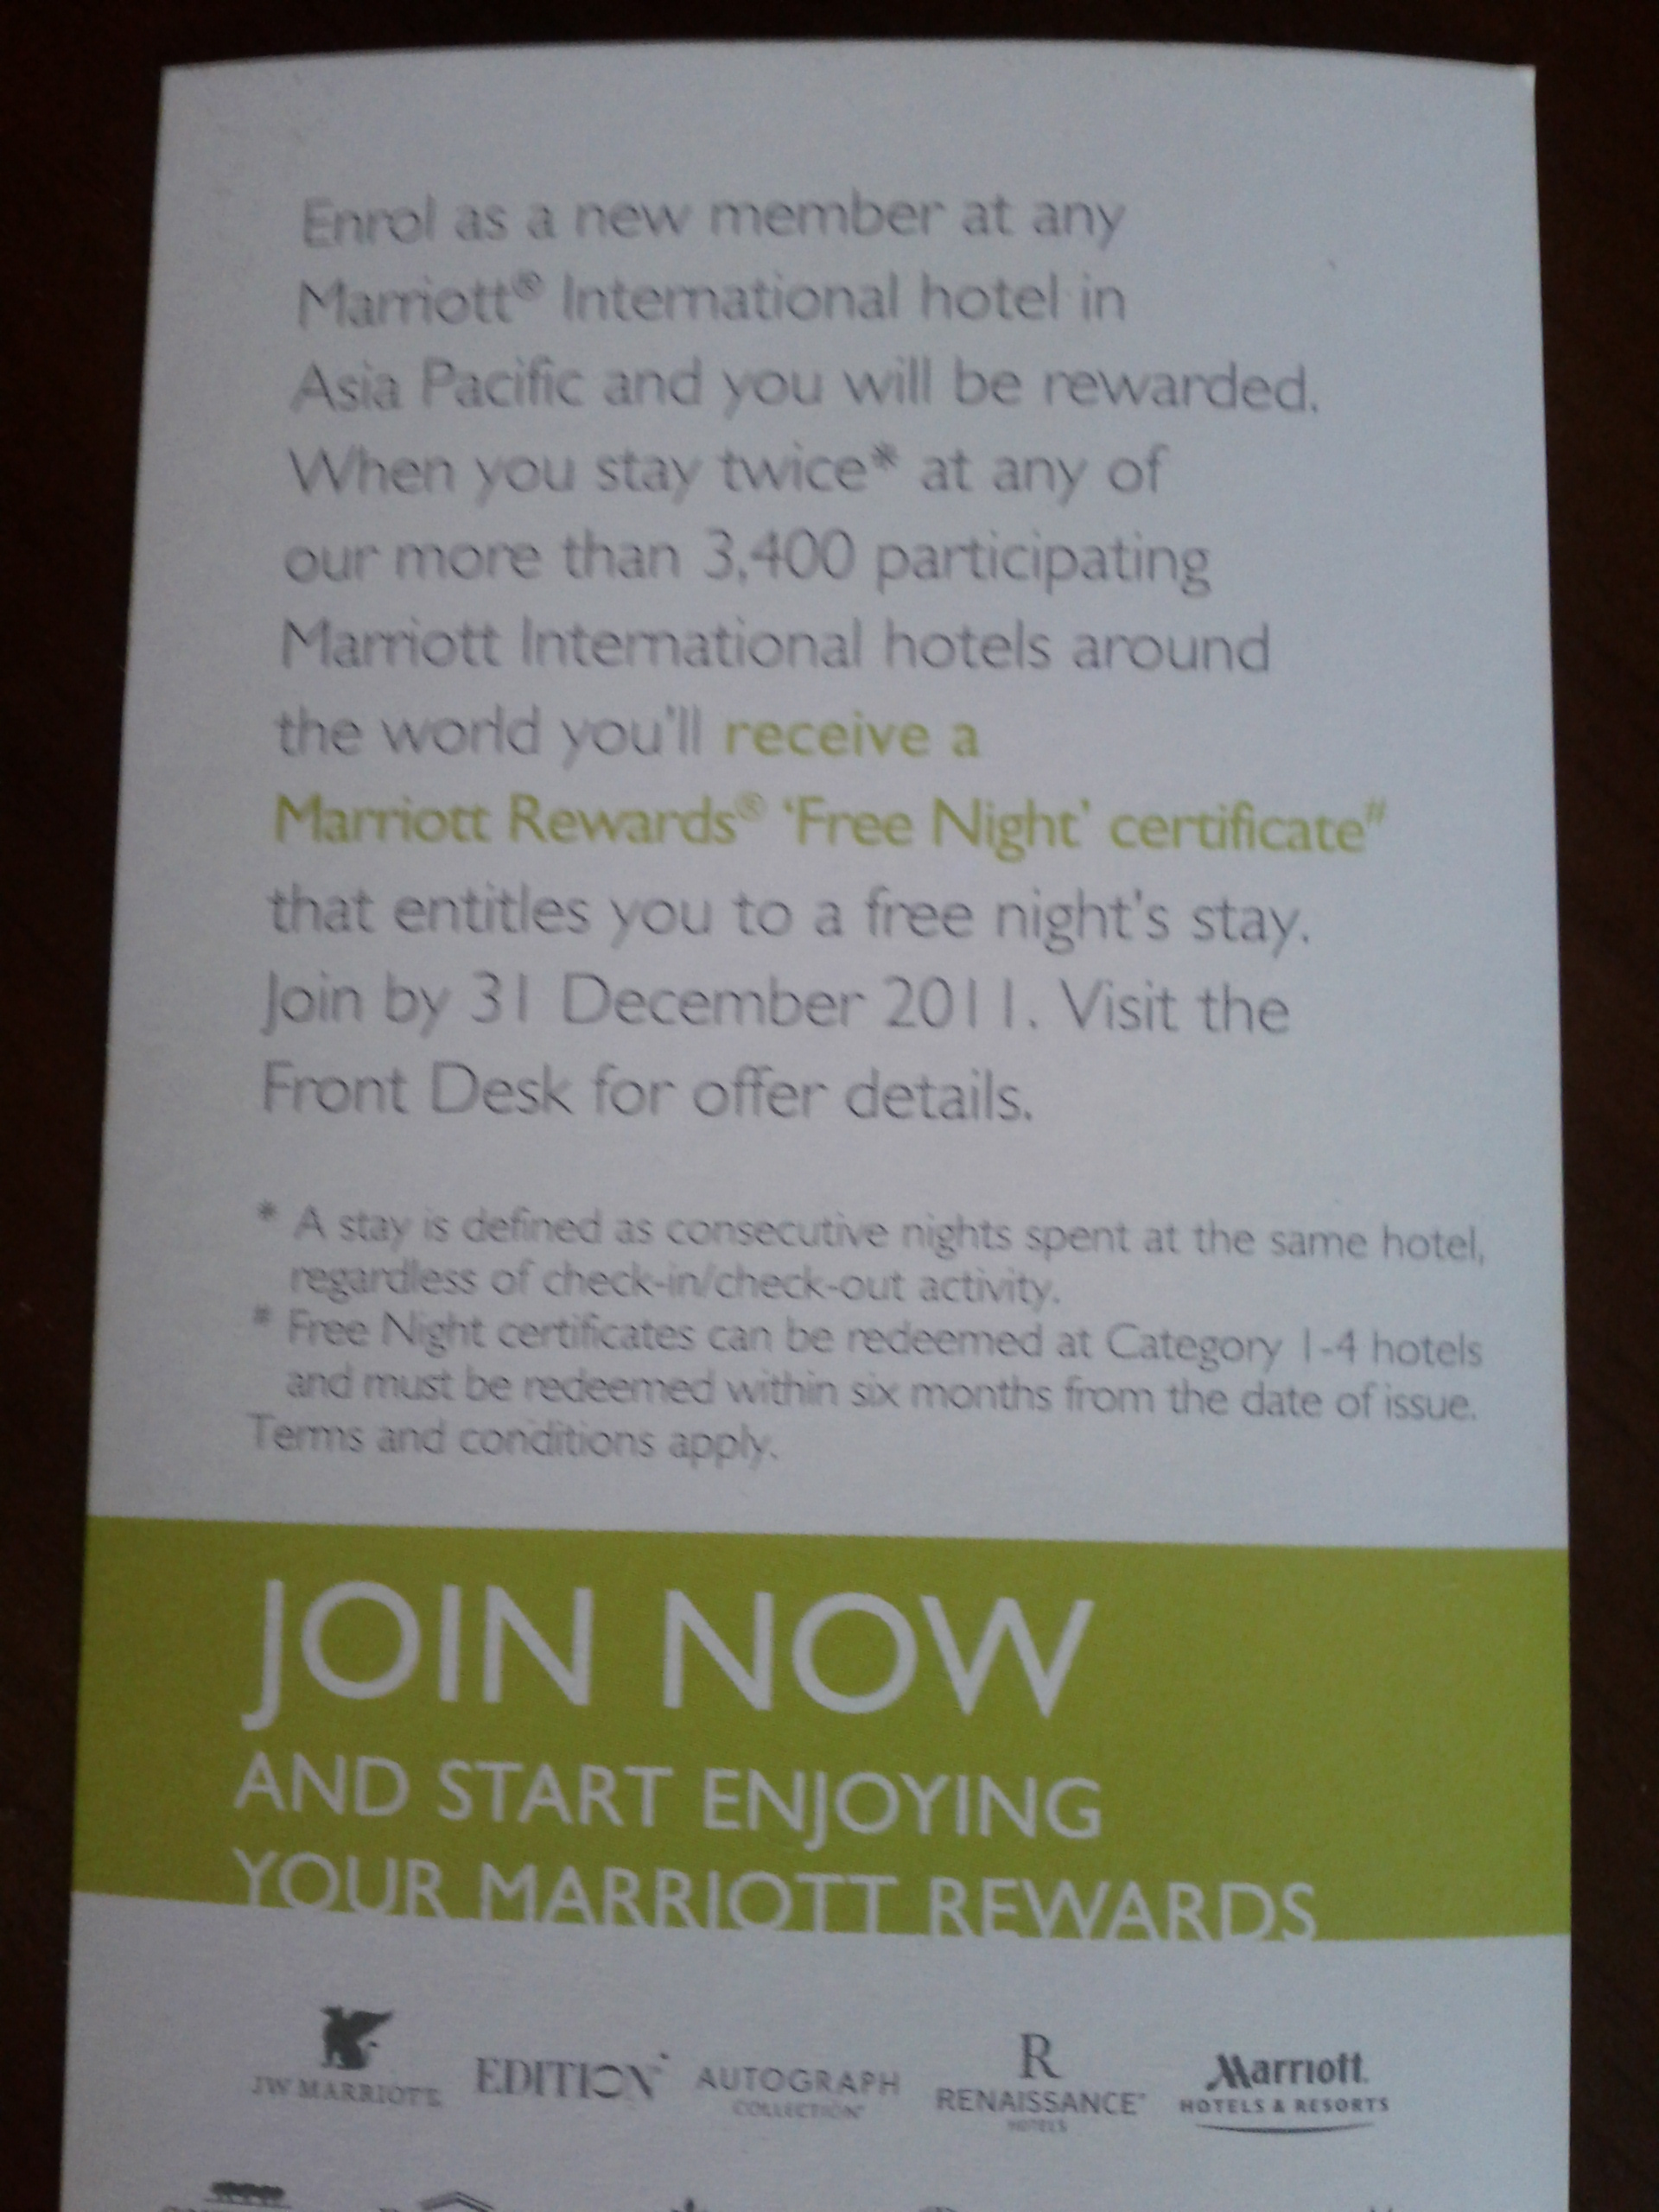 Marriott rewards sign up bonus free night certificate or instant marriott rewards sign up offer stay twice stay free 2 1betcityfo Choice Image